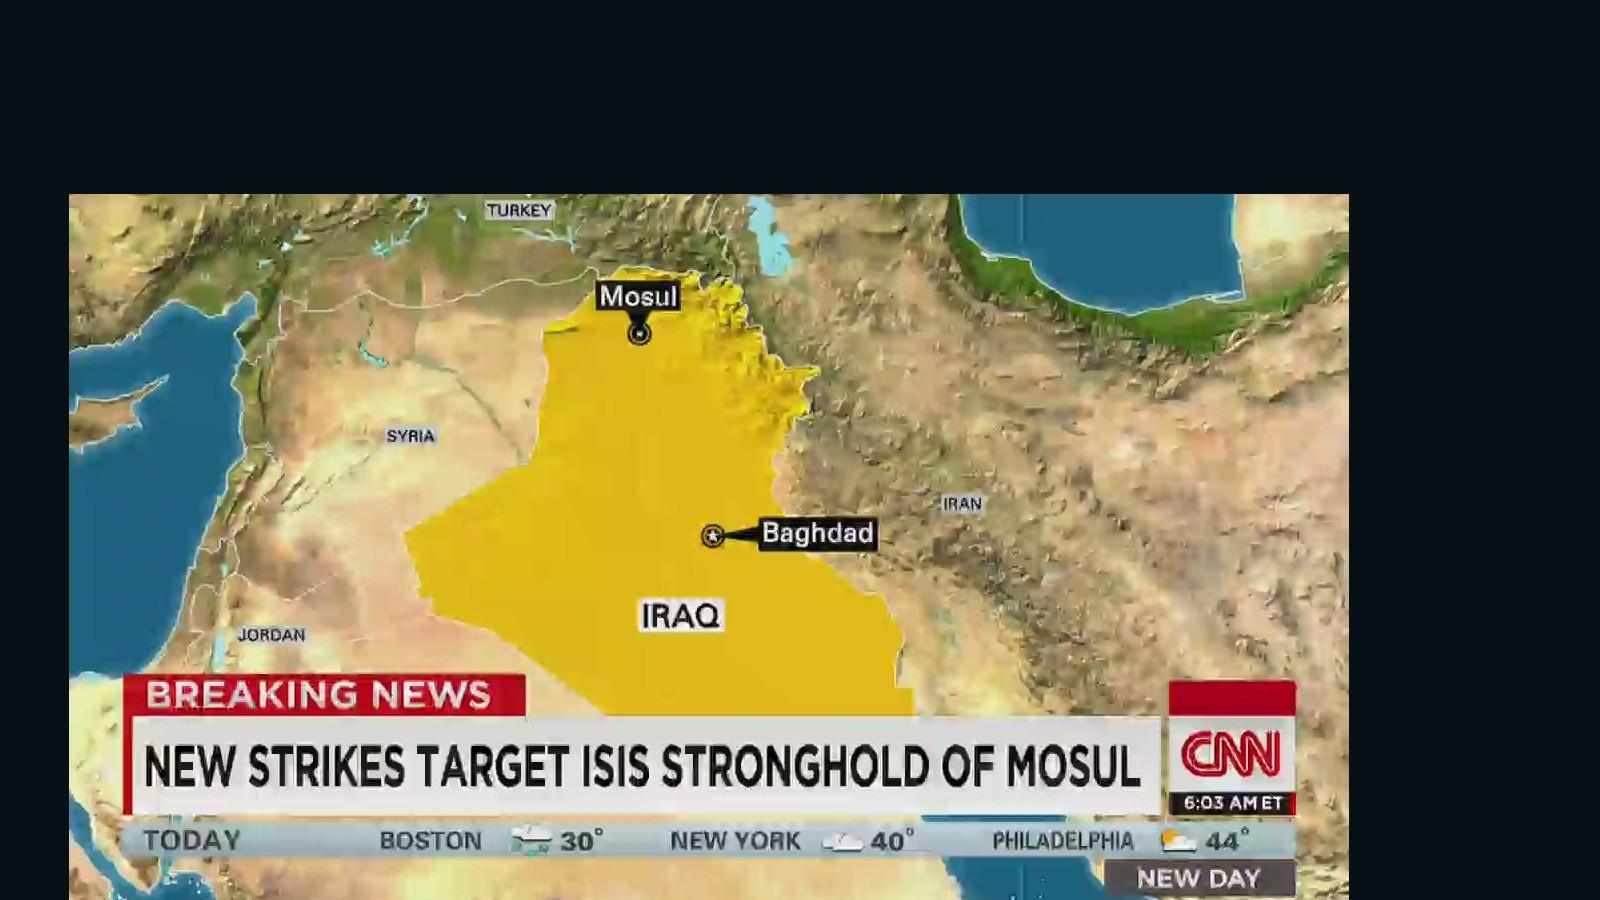 New airstrike kills ISIS militants - CNN Video